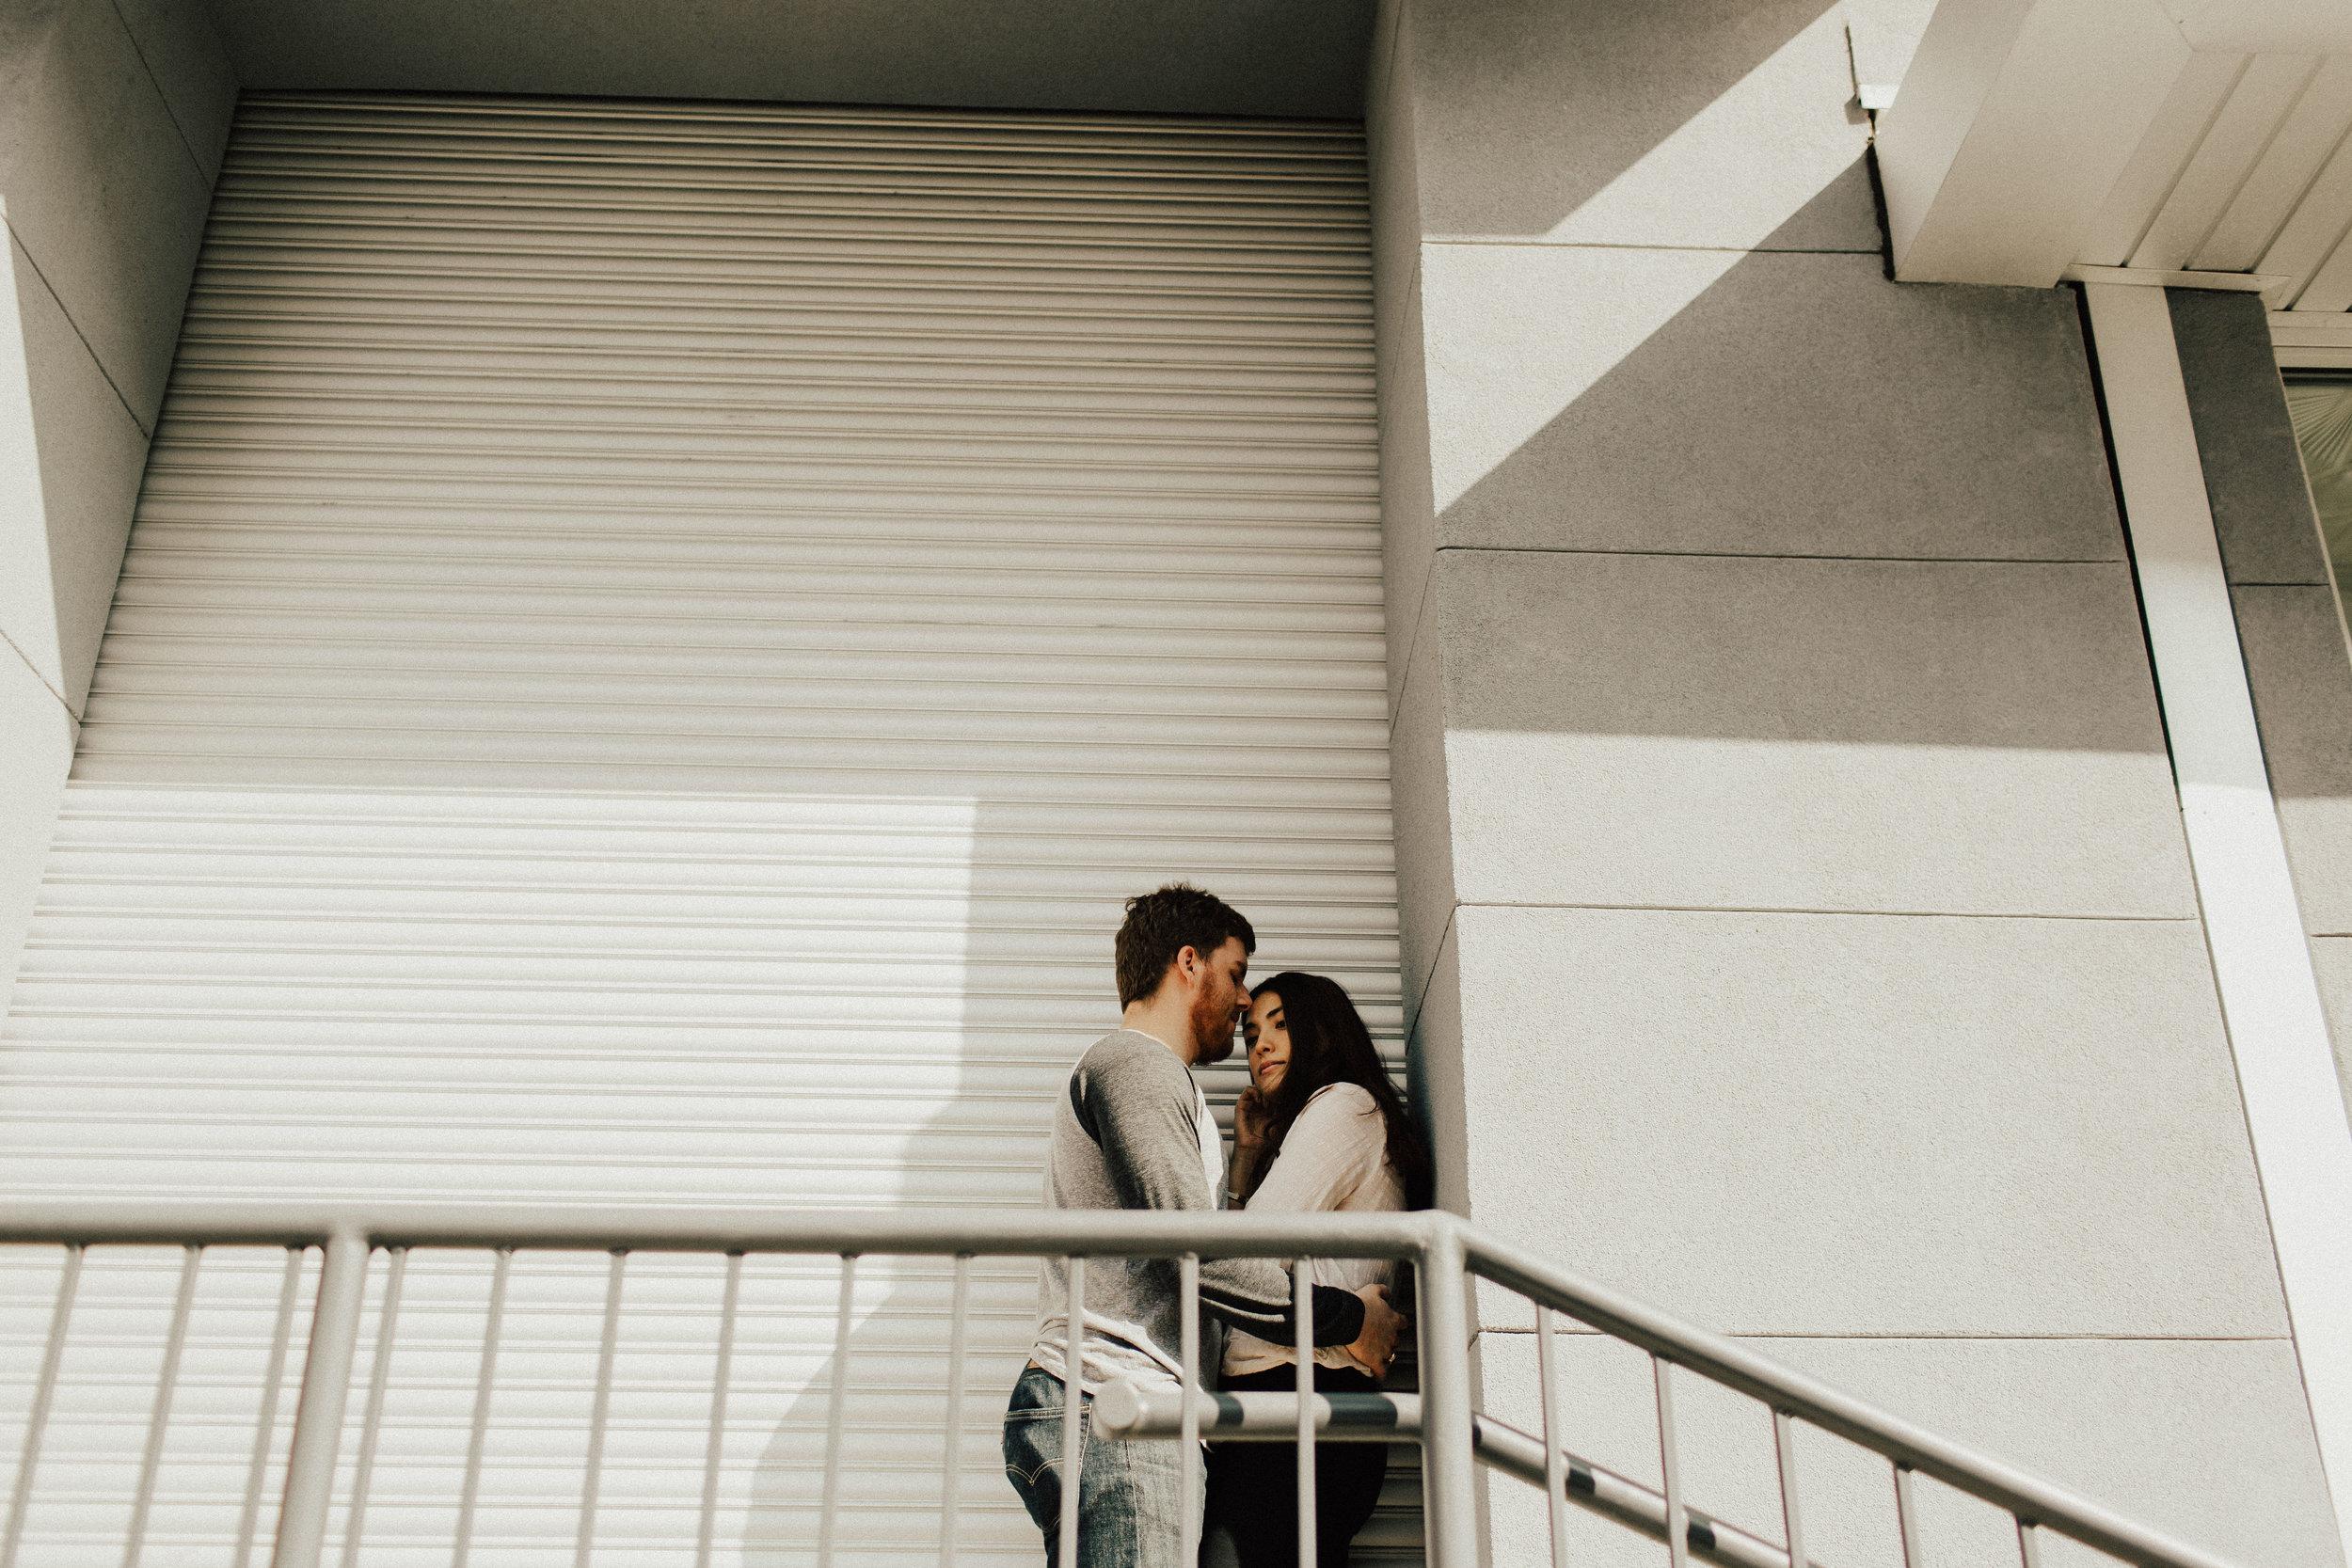 bianca-troy-east-austin-couple-photographer-25